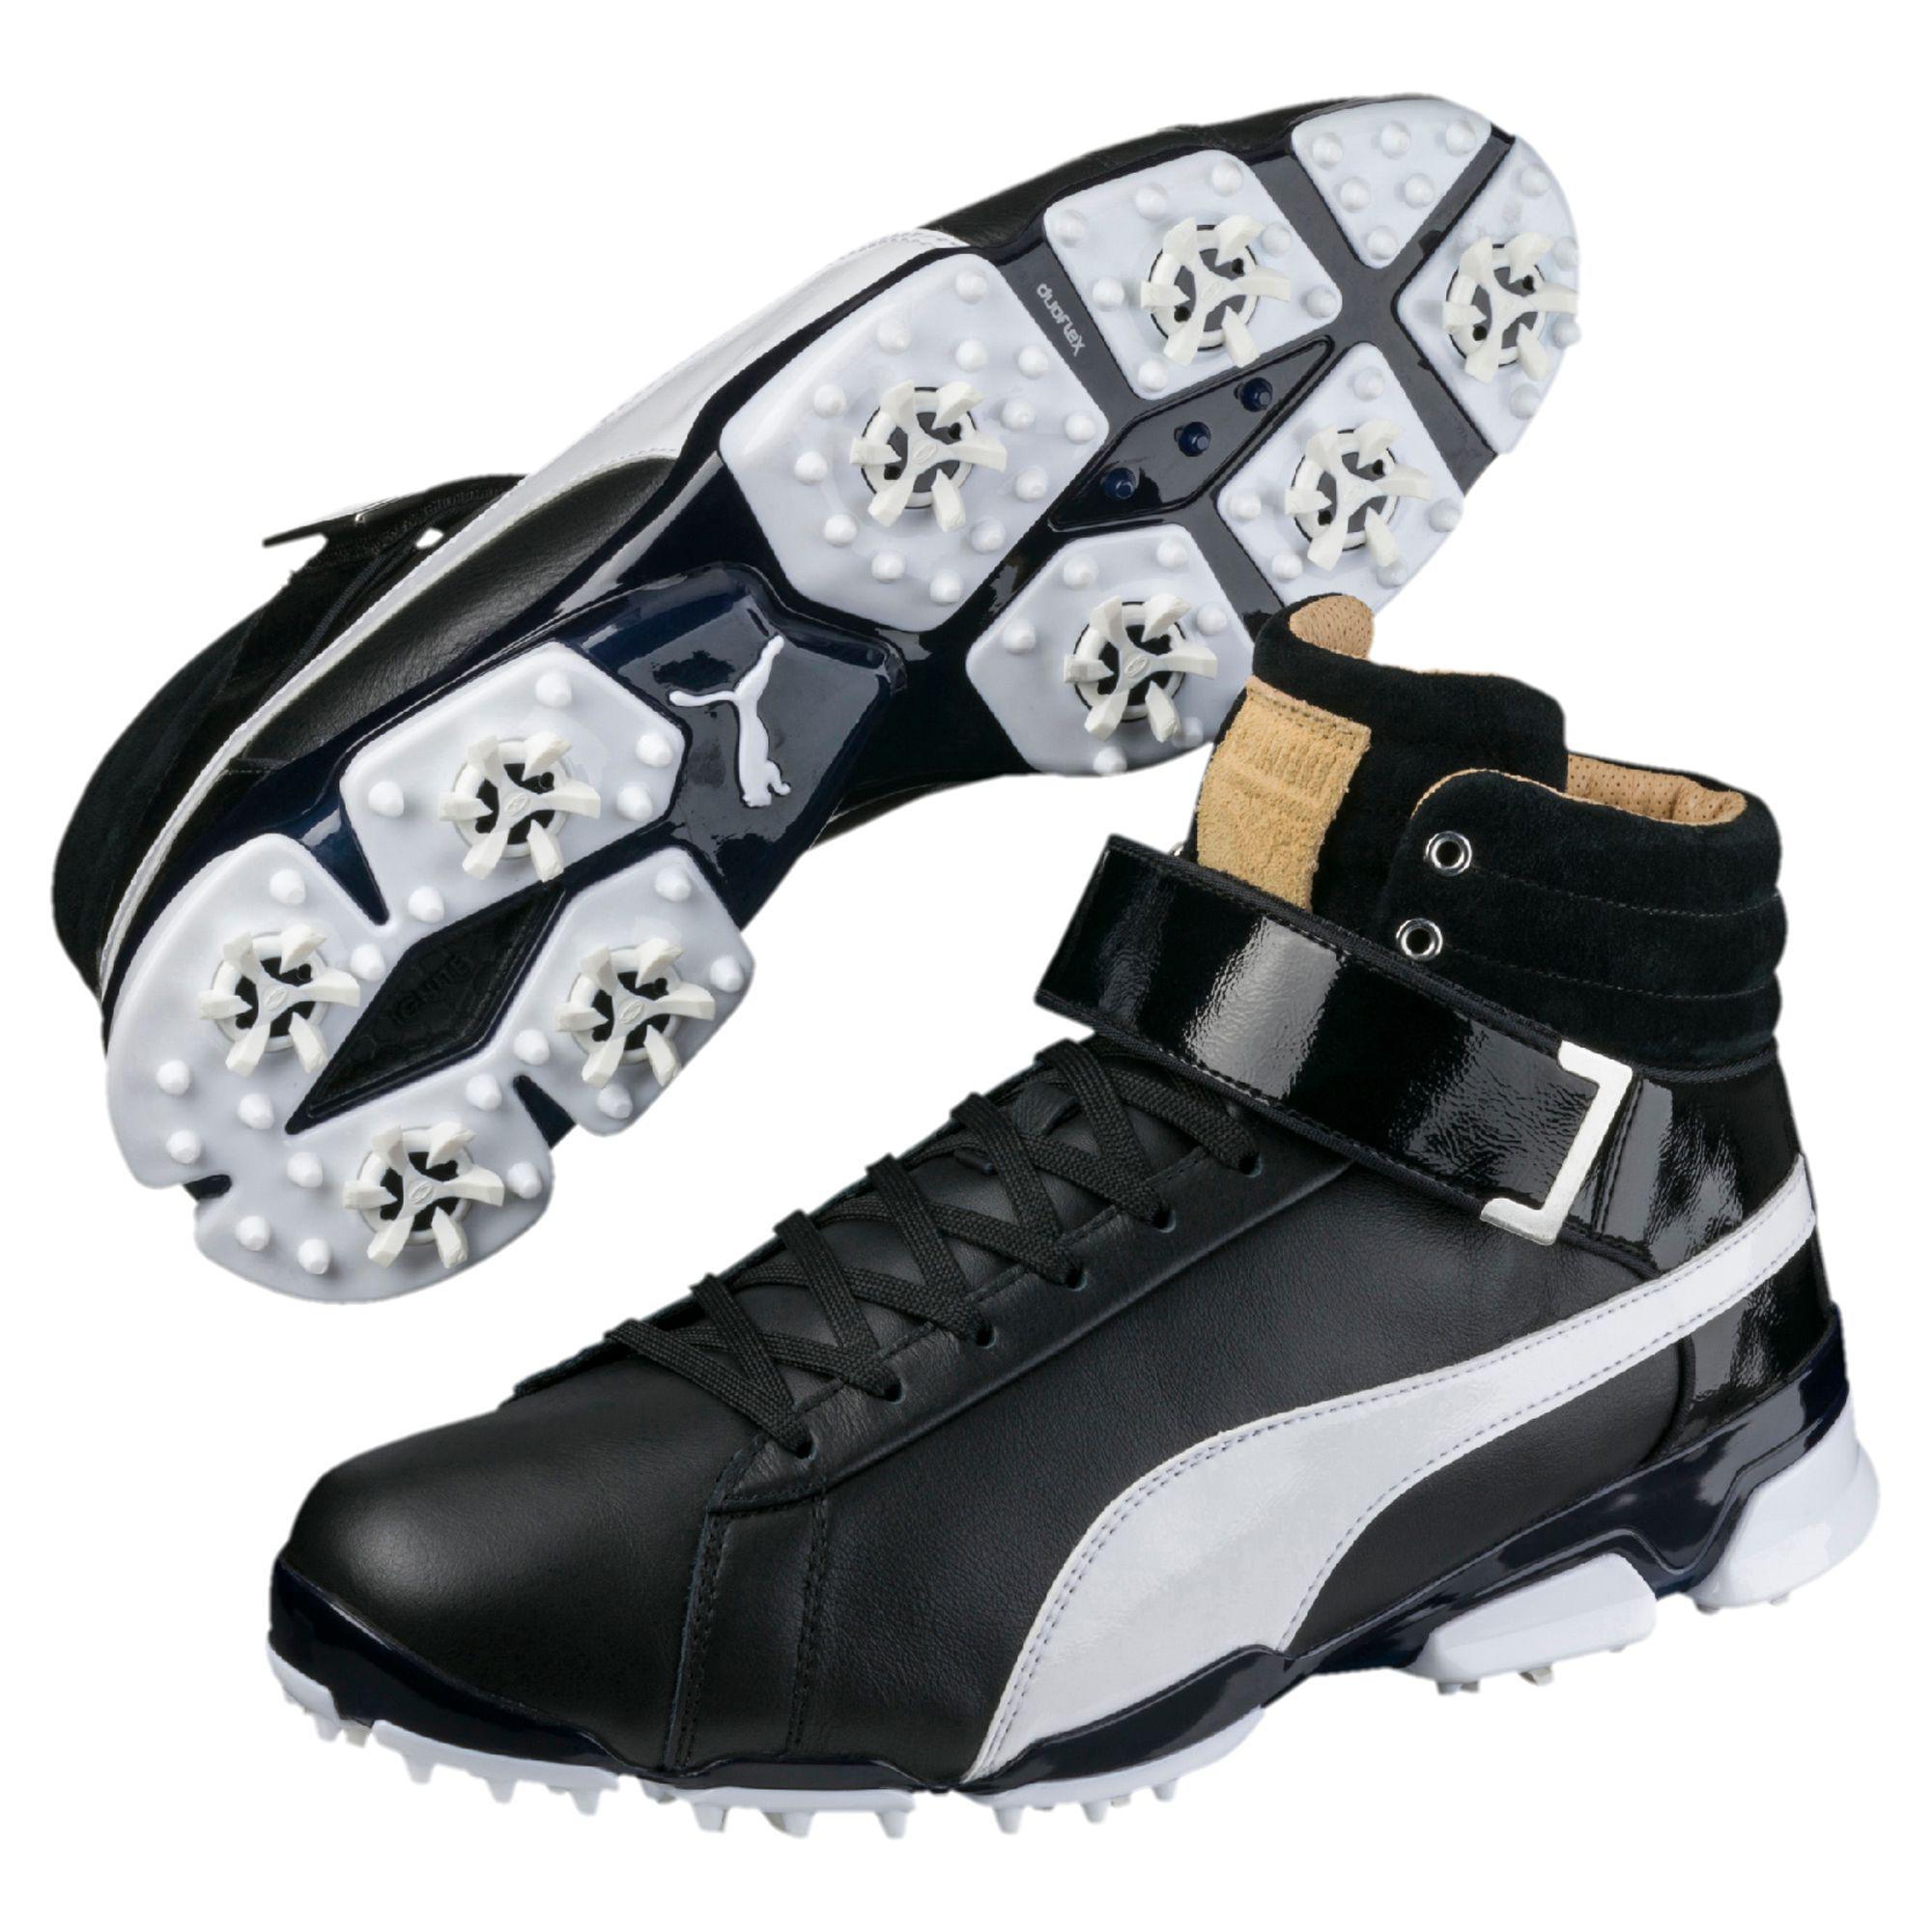 Lyst - PUMA Titantour Ignite High-top Men s Golf Shoes in Black for Men 622da0bc9